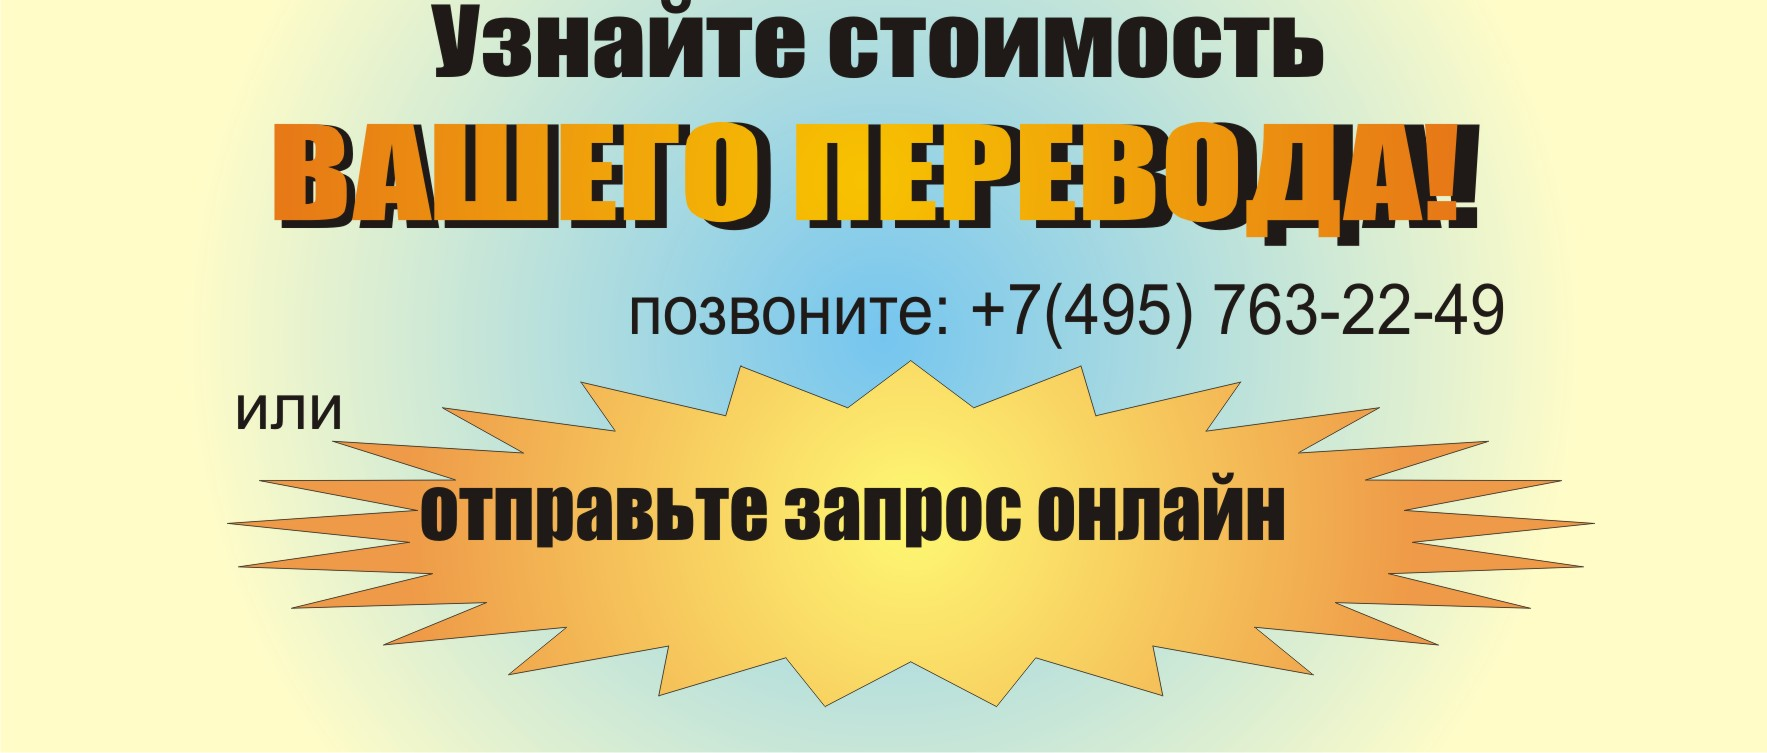 Бюро переводов Рема podolsk